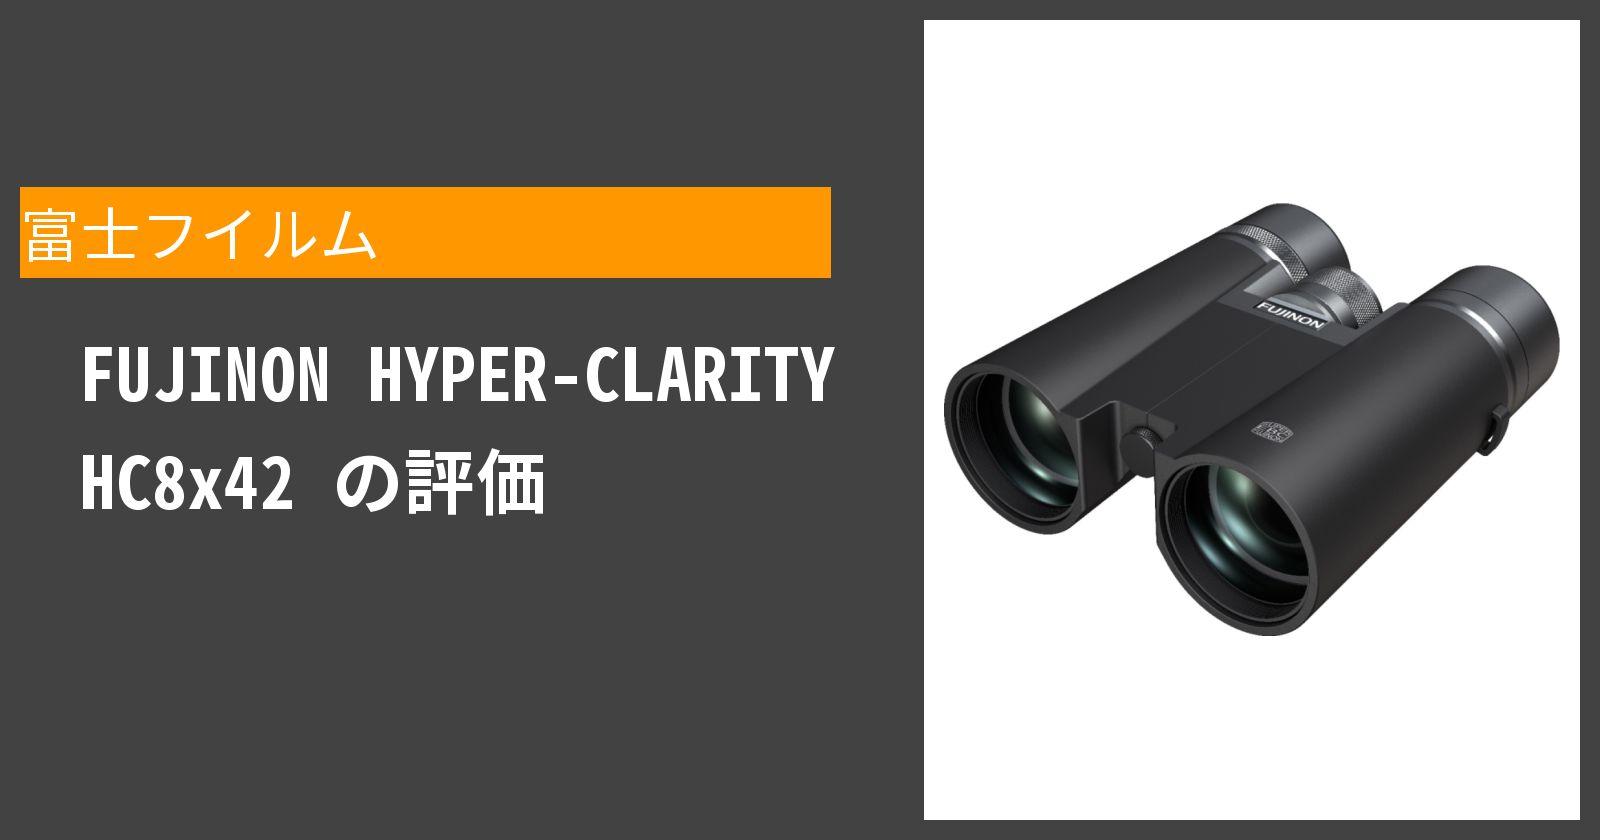 FUJINON HYPER-CLARITY HC8x42を徹底評価